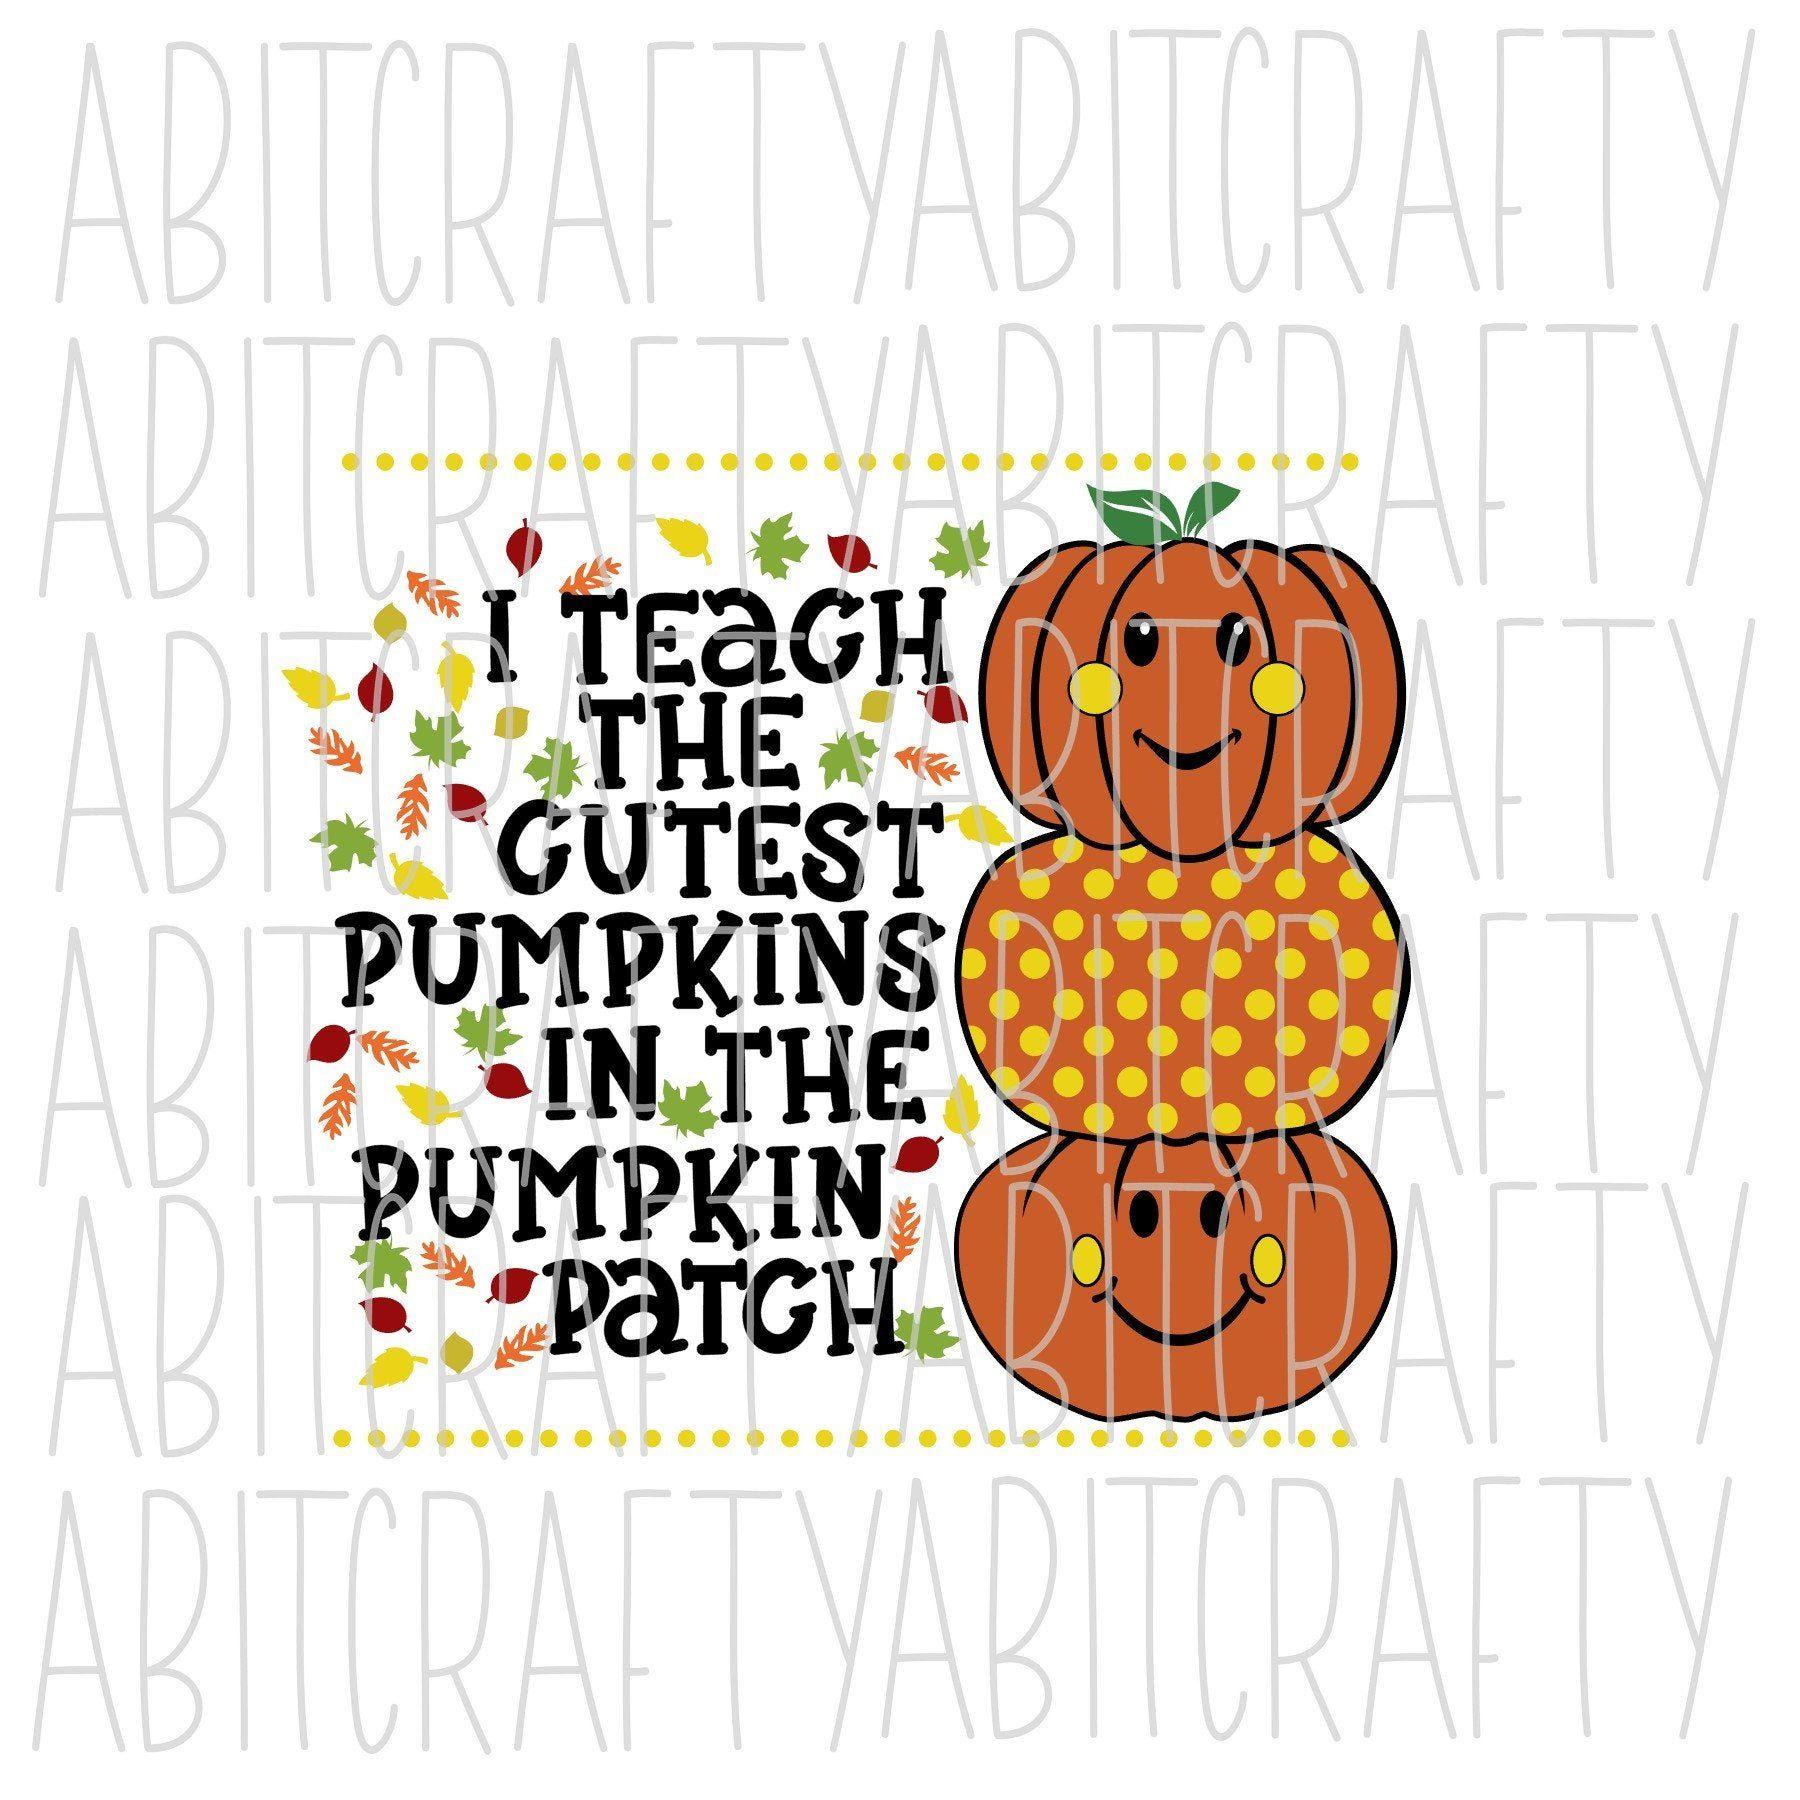 I Teach The Cutest Pumpkins In The Pumpkin Patch Svg Png Sublimation Digital Download Digital Download Etsy Cute Pumpkin Free Jokes